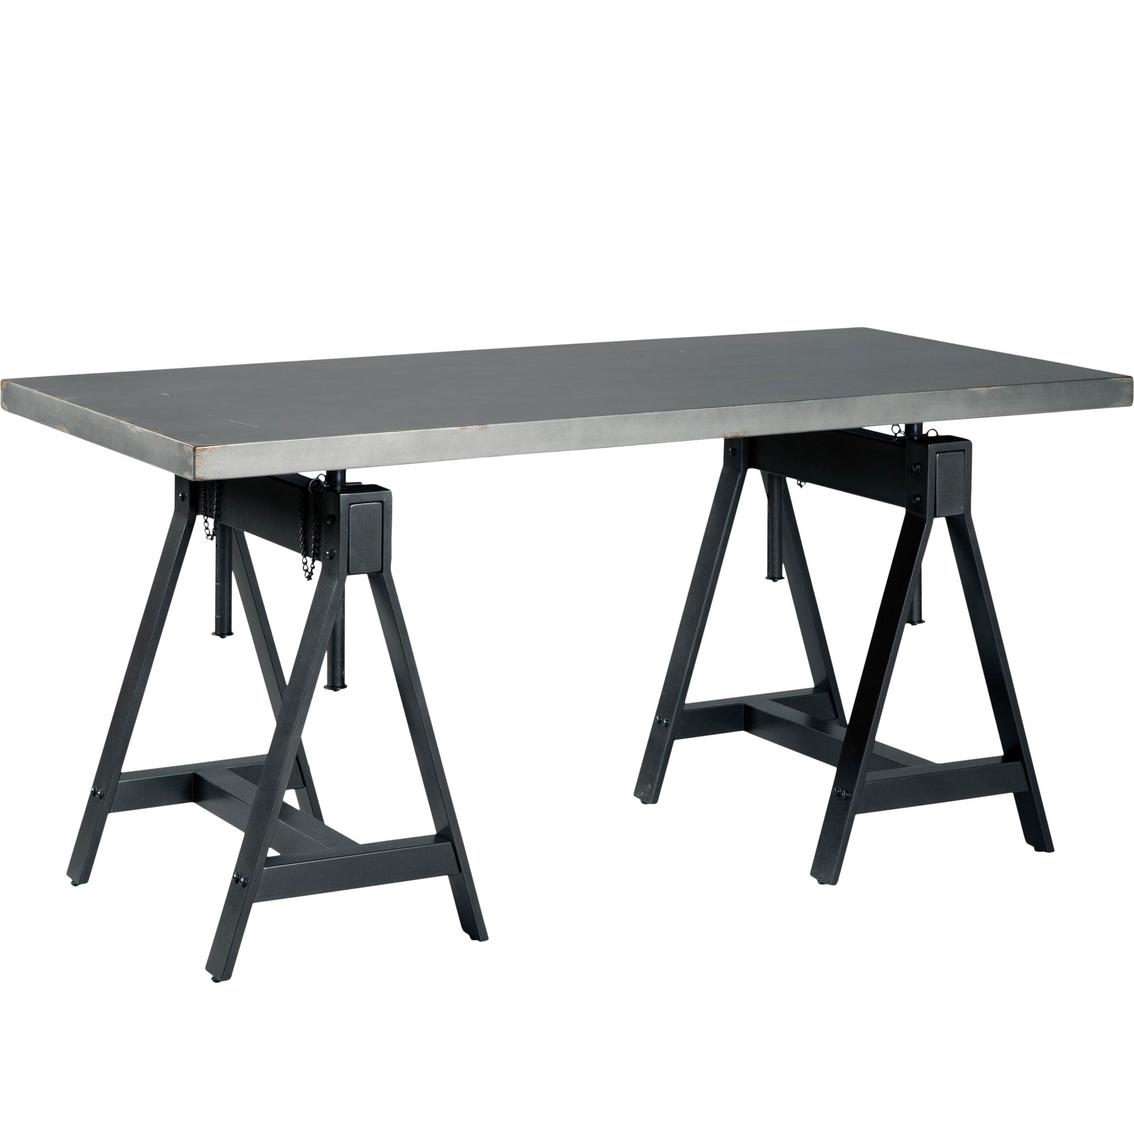 Signature design by ashley minnona rectangular adjustable height dining table